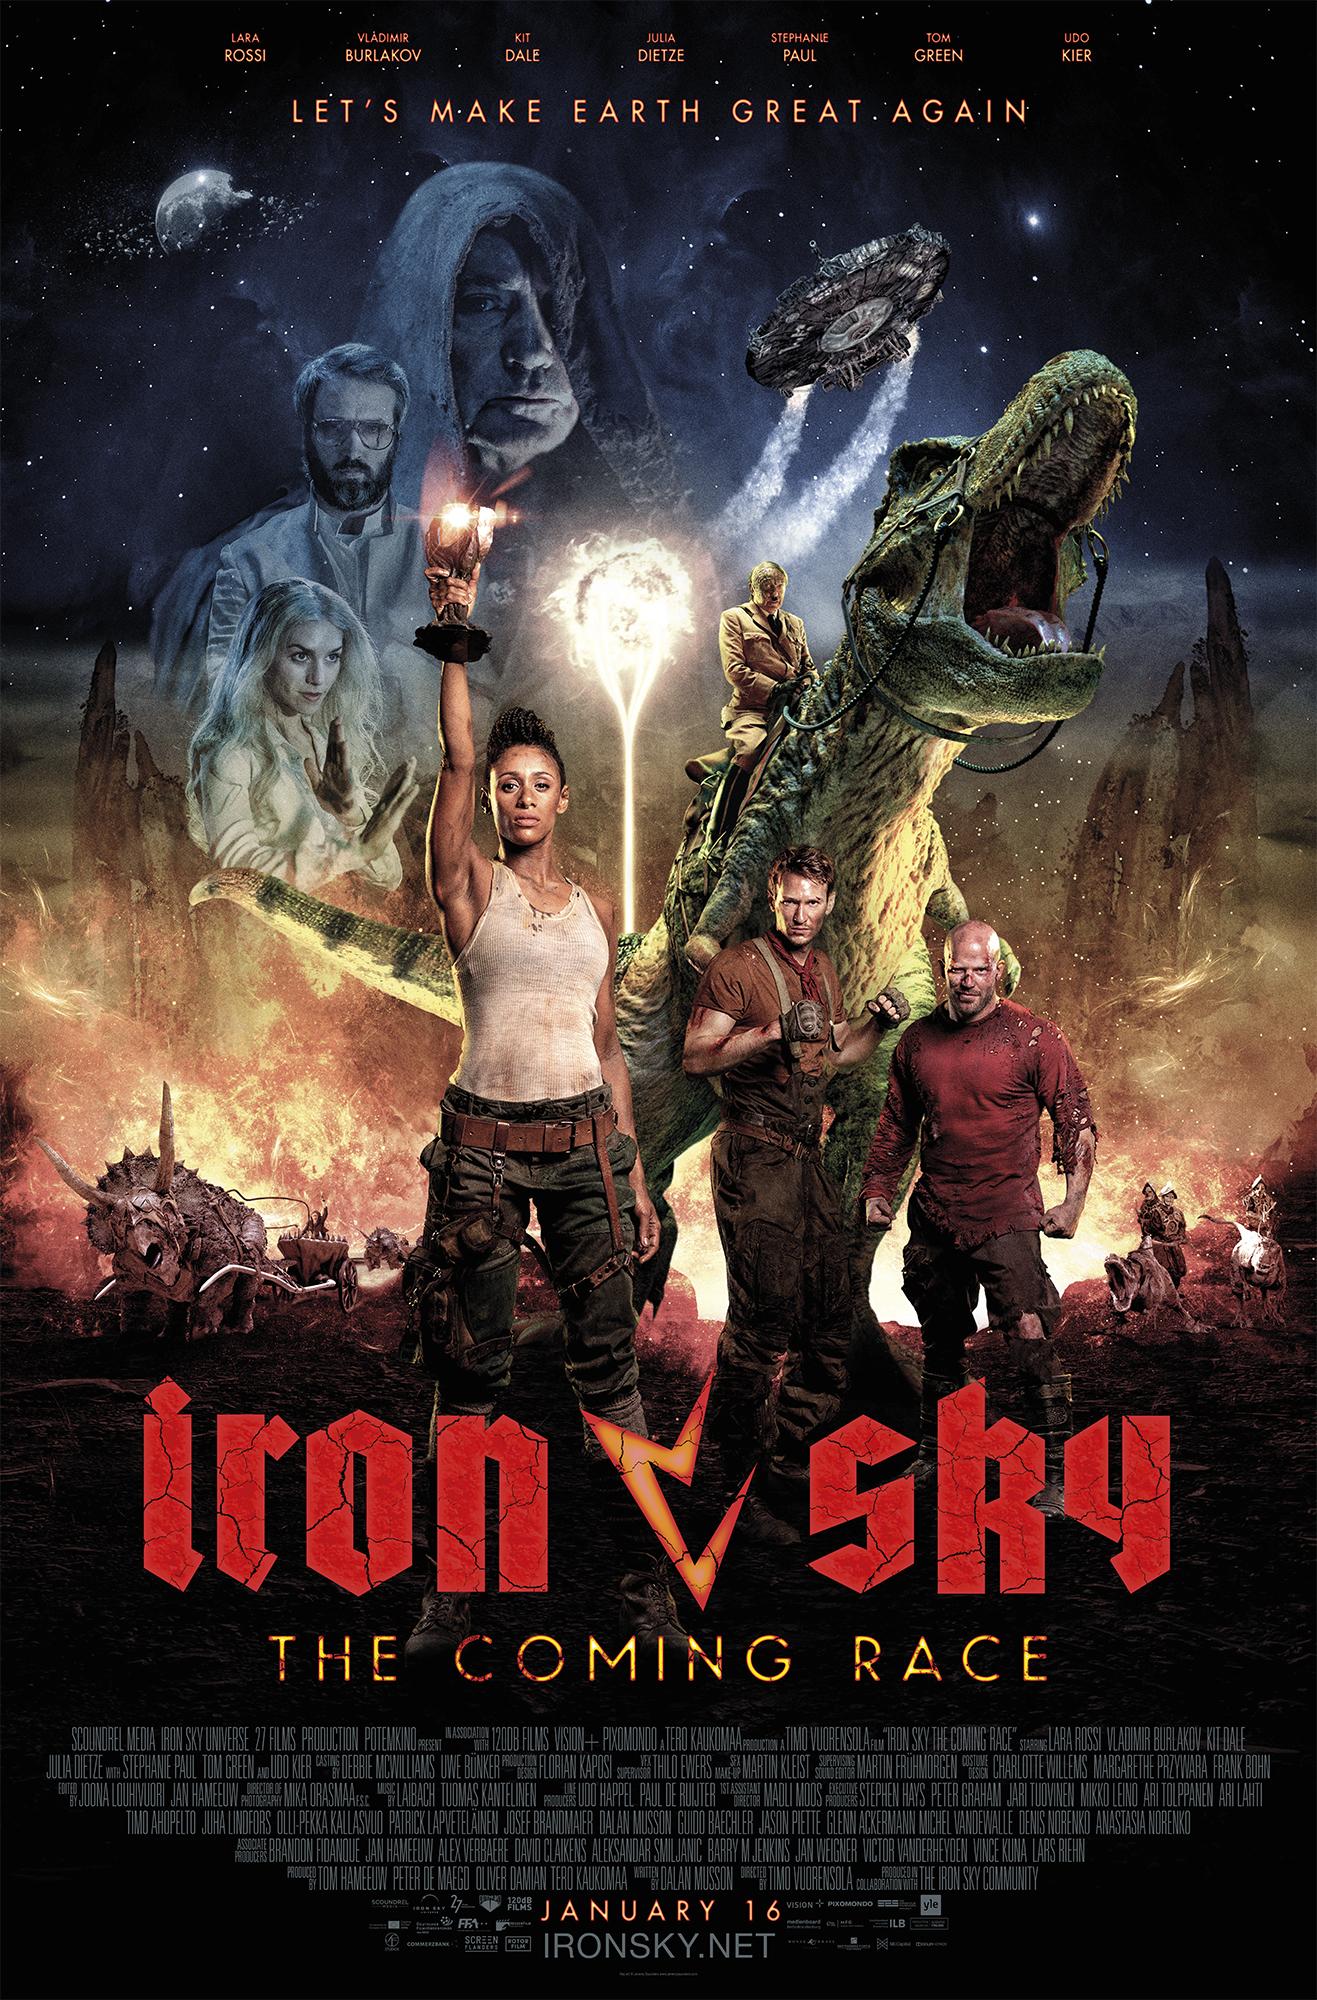 Iron Sky The Coming Race (2019)